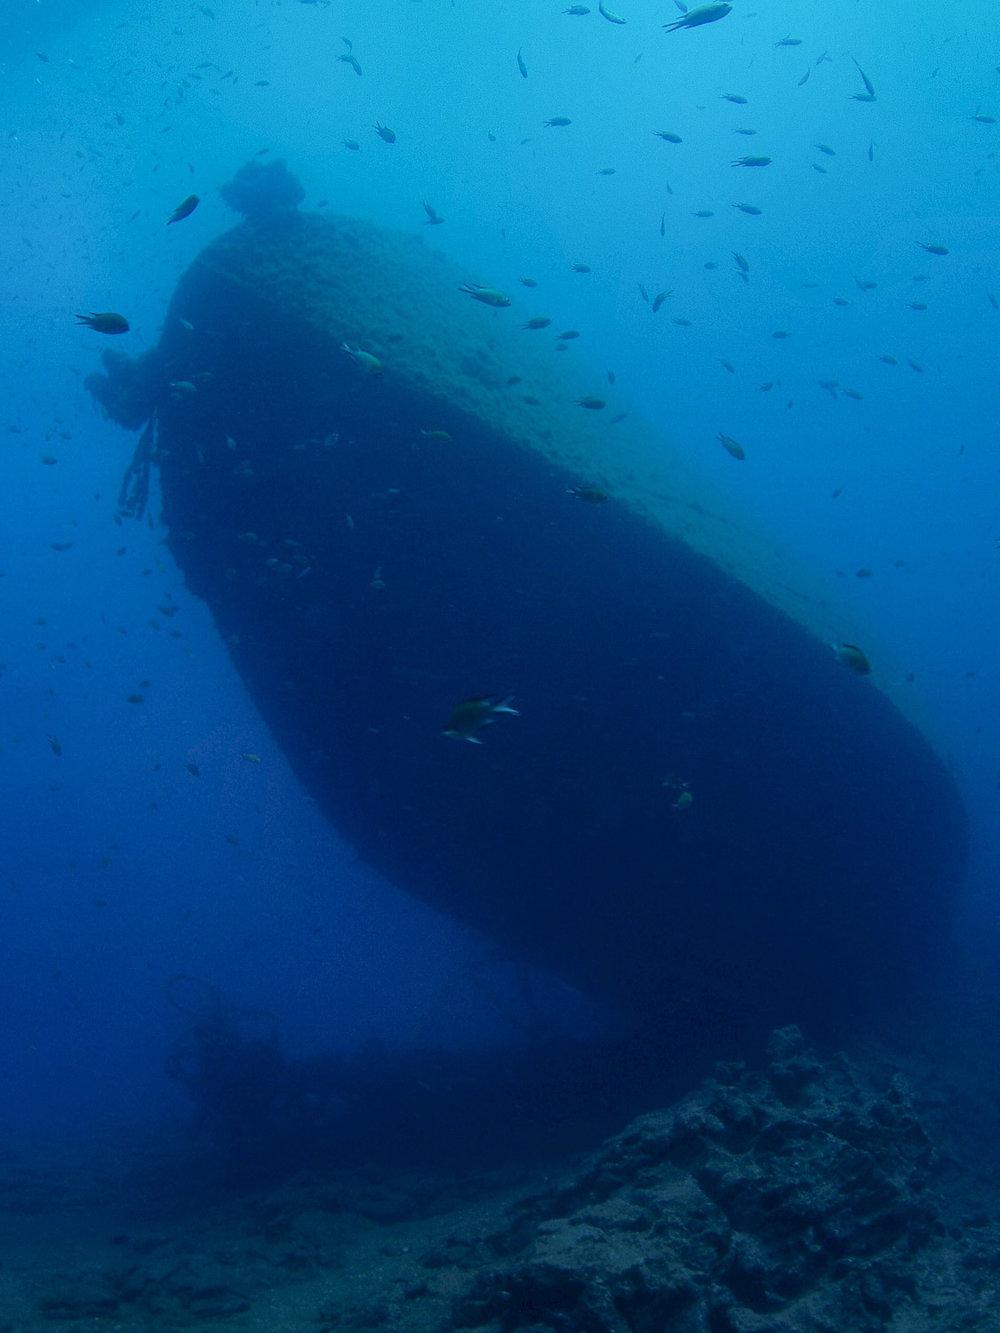 underwater lanzarote-5.jpg